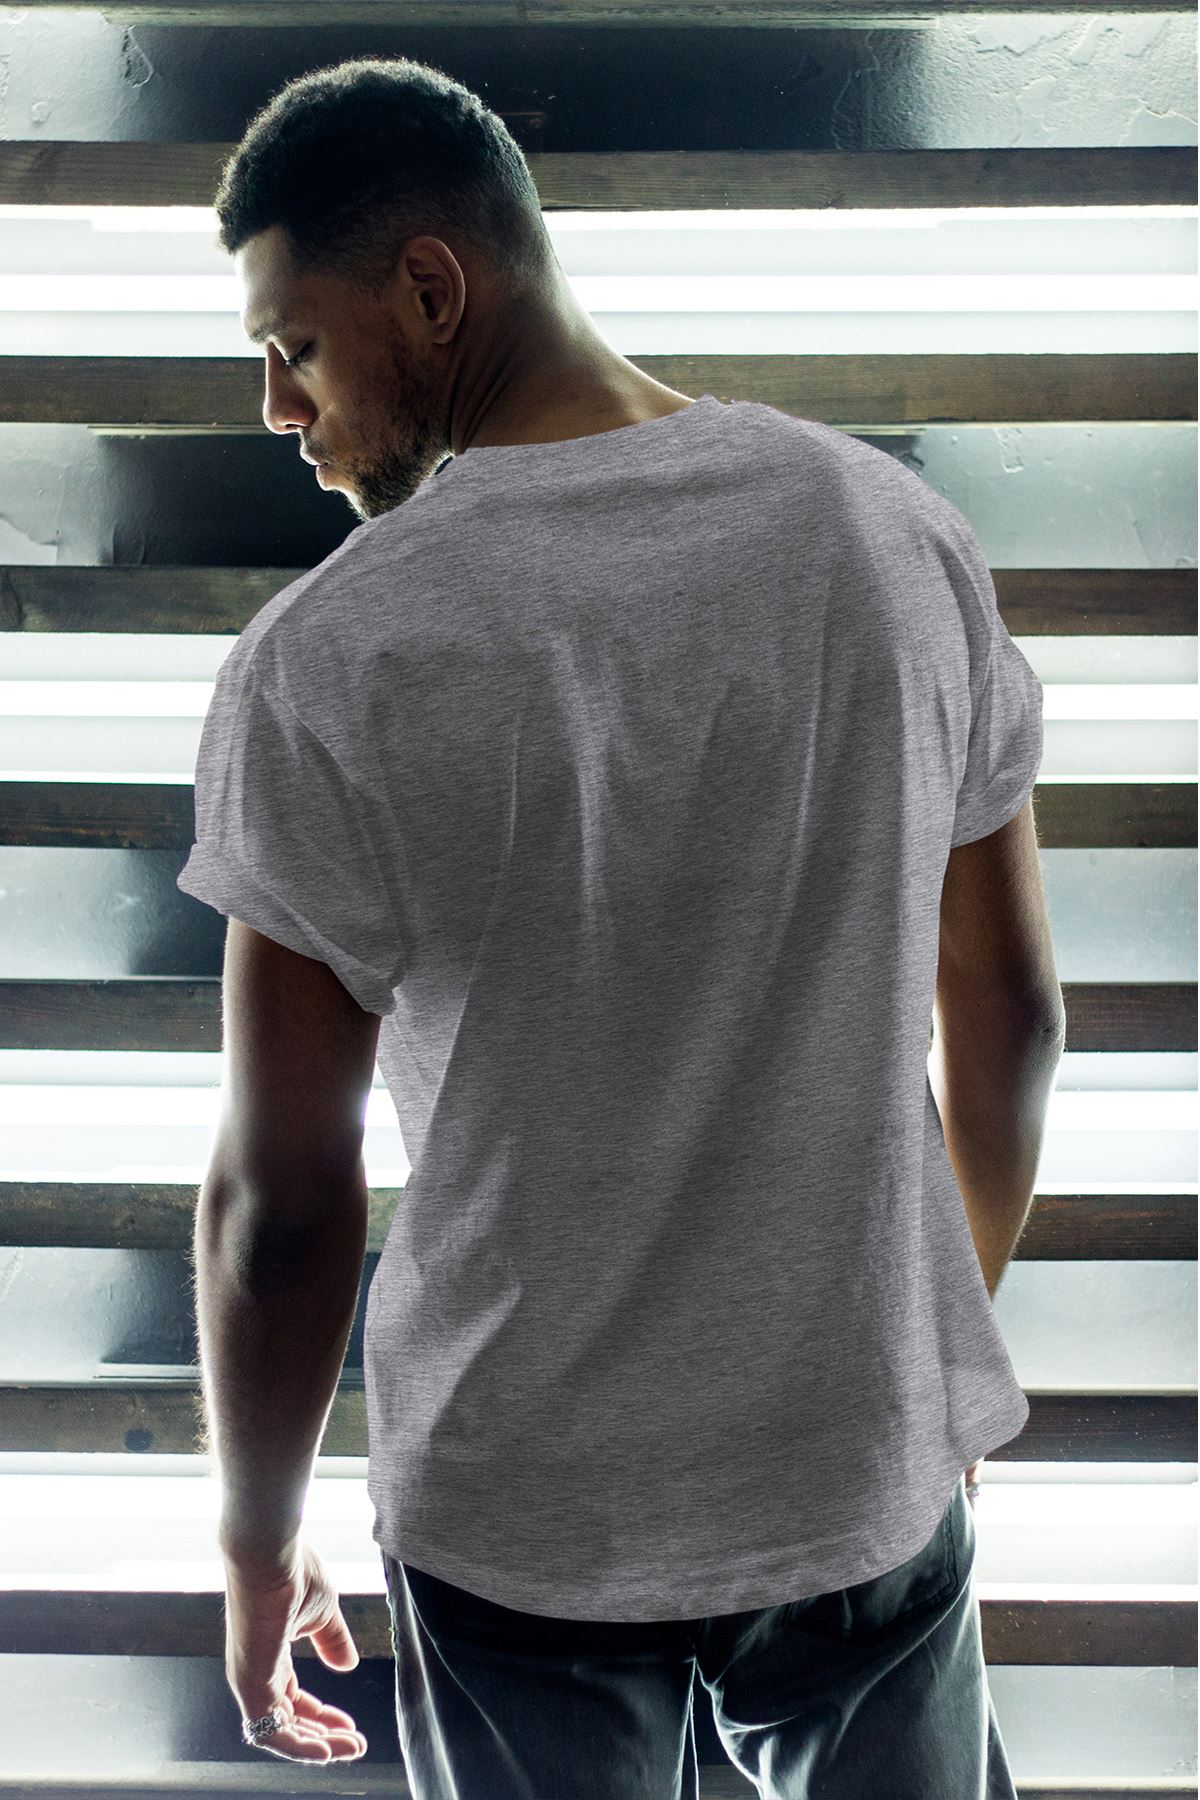 Anime Death Note 07 Gri Erkek Oversize Tshirt - Tişört